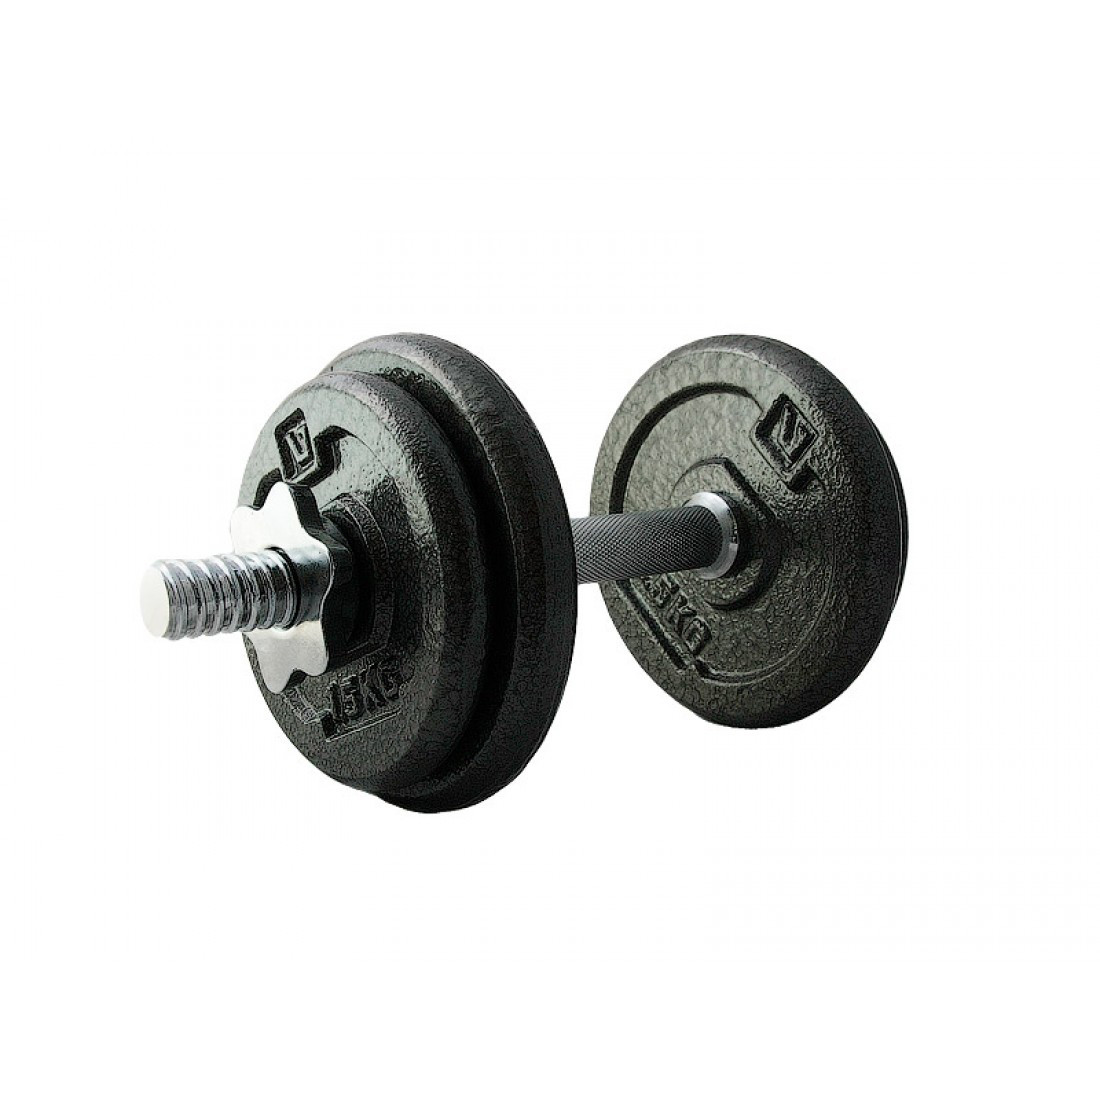 Гантель наборная железная LiveUp DUMBELL SET, 10 кг